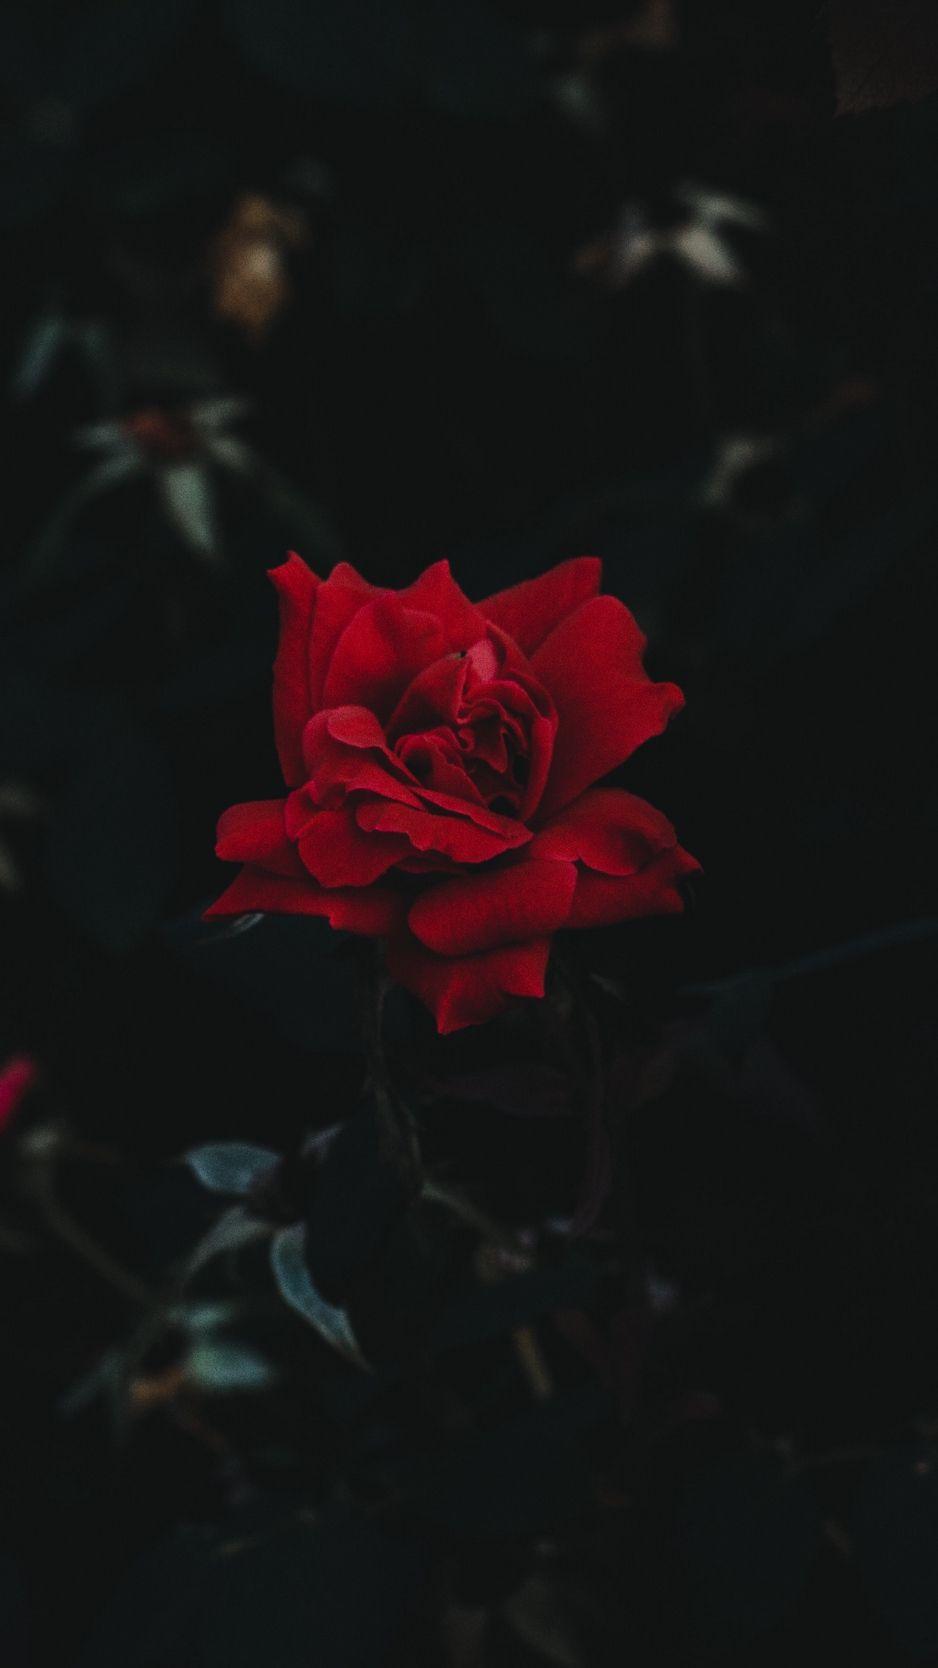 Dark Floral Iphone Wallpaper Wallpaper Iphone Roses Red Roses Wallpaper Rose Wallpaper